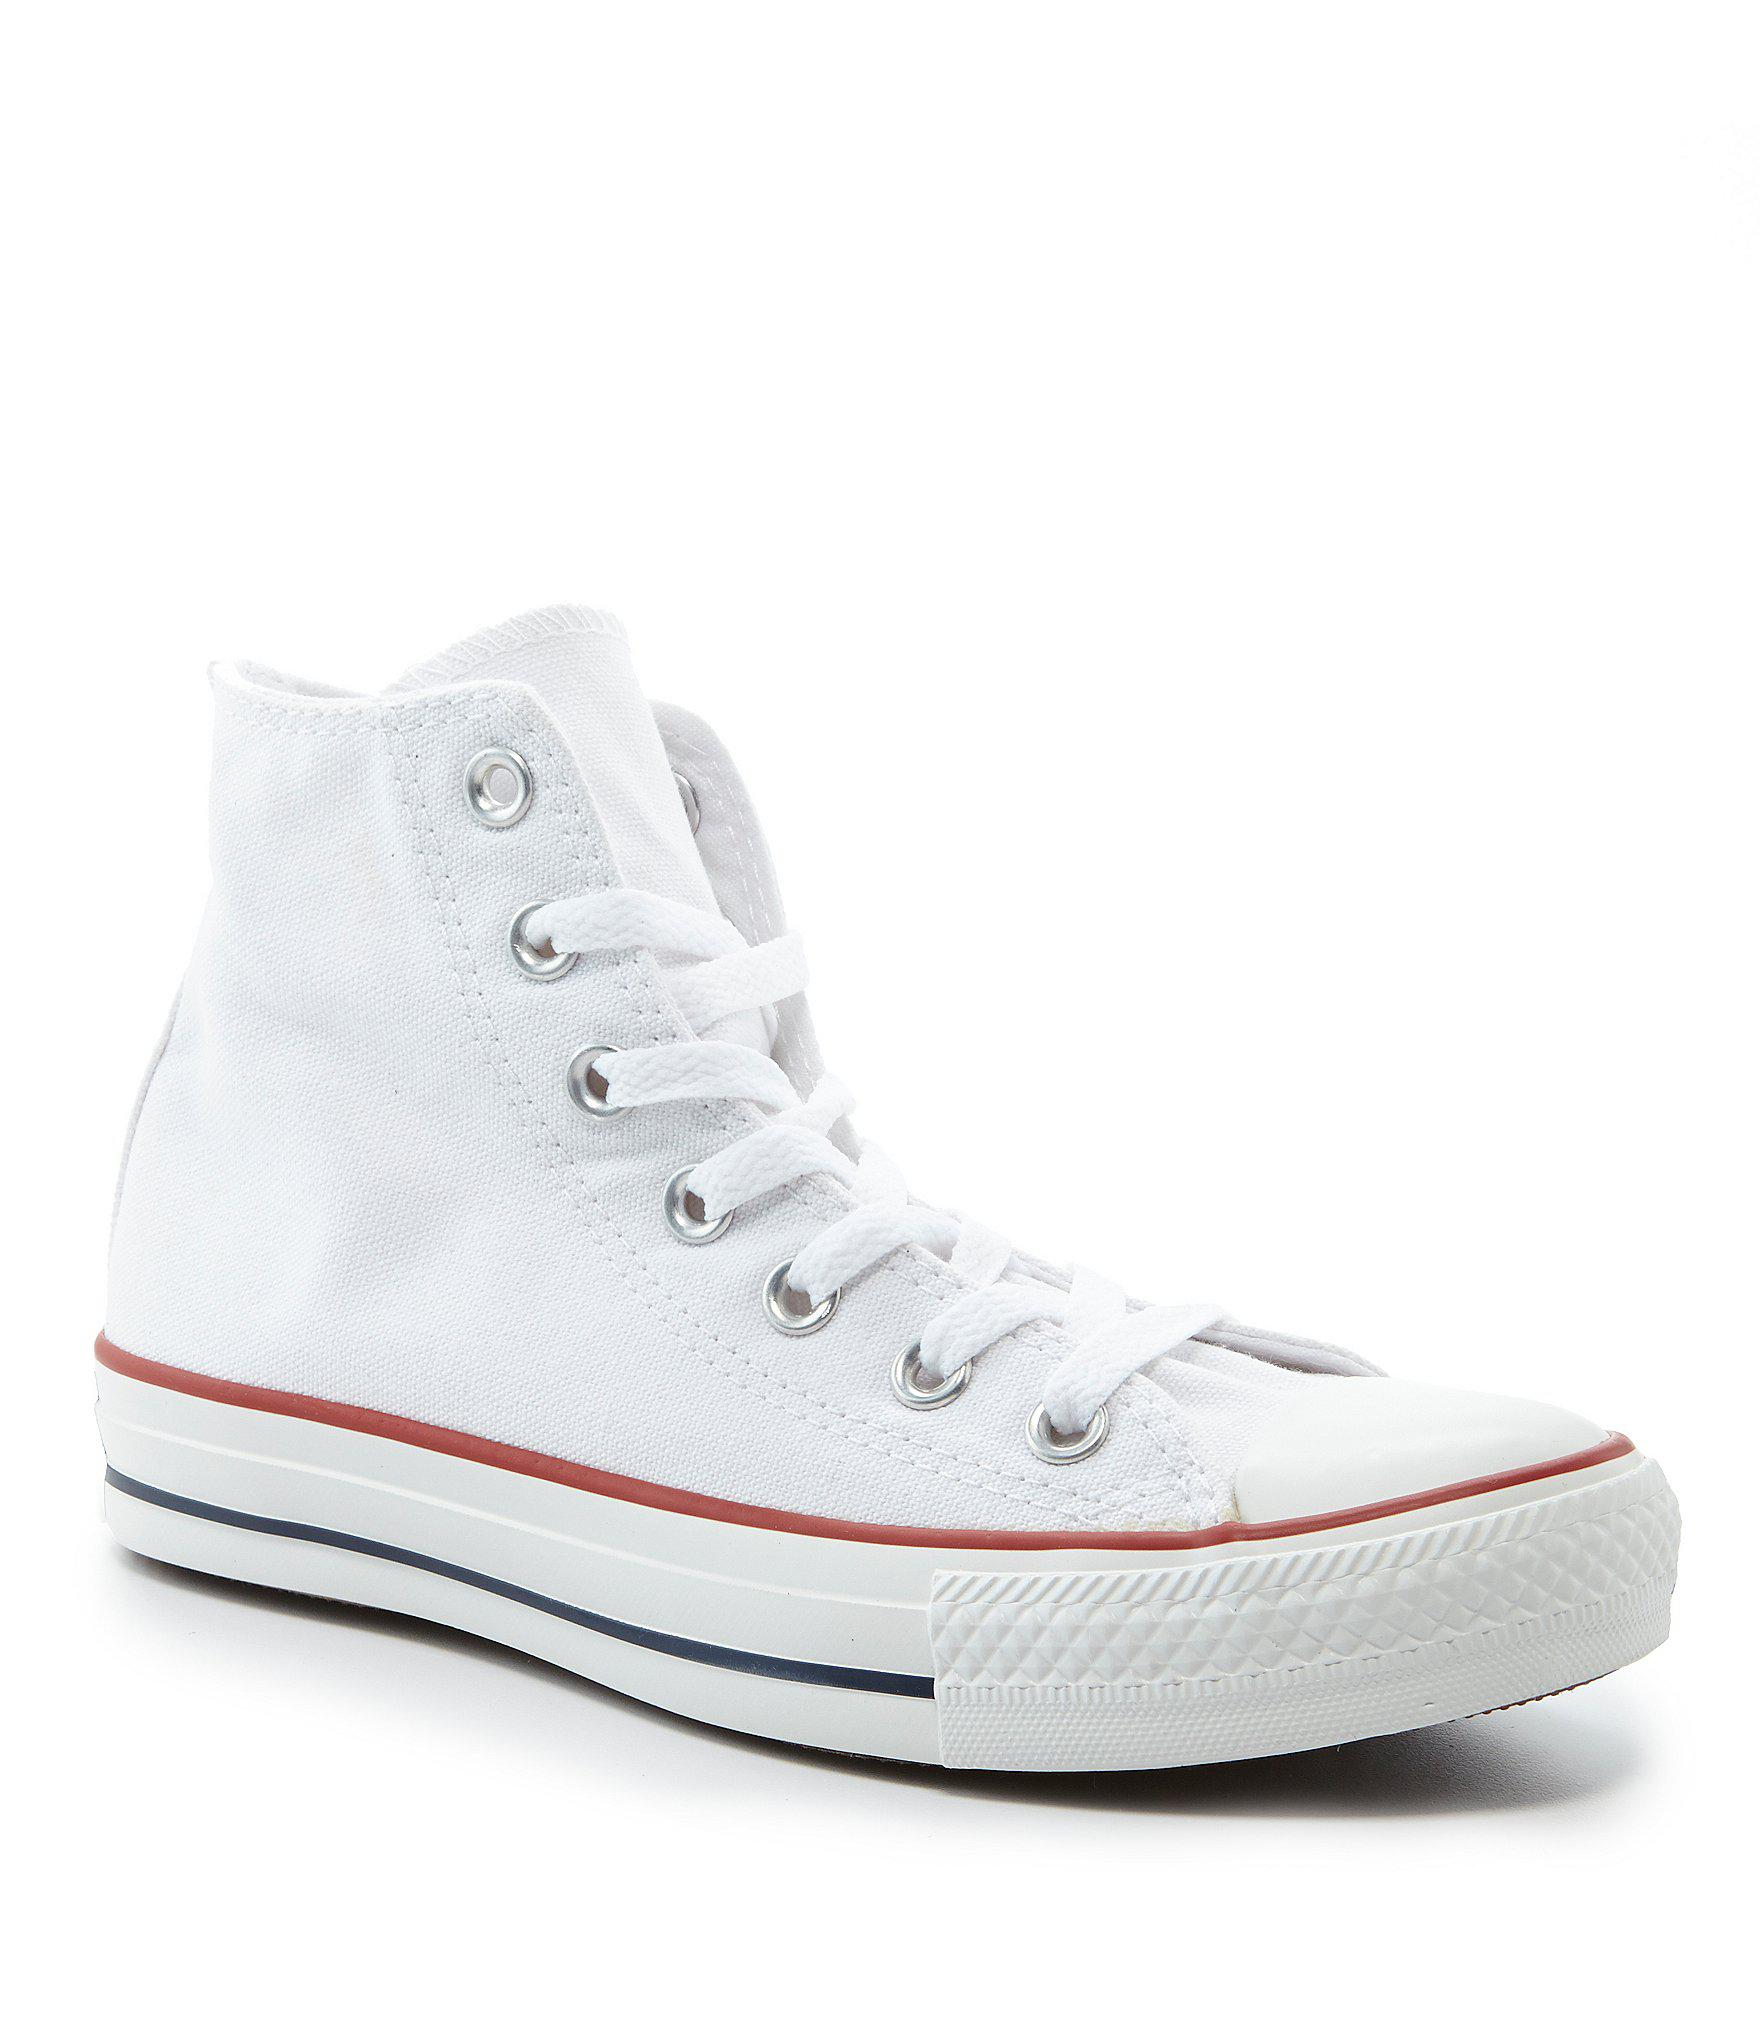 d3ca9a82f7d0 Converse White Chuck Taylor® All-star® Core Hi-top Sneakers. View fullscreen